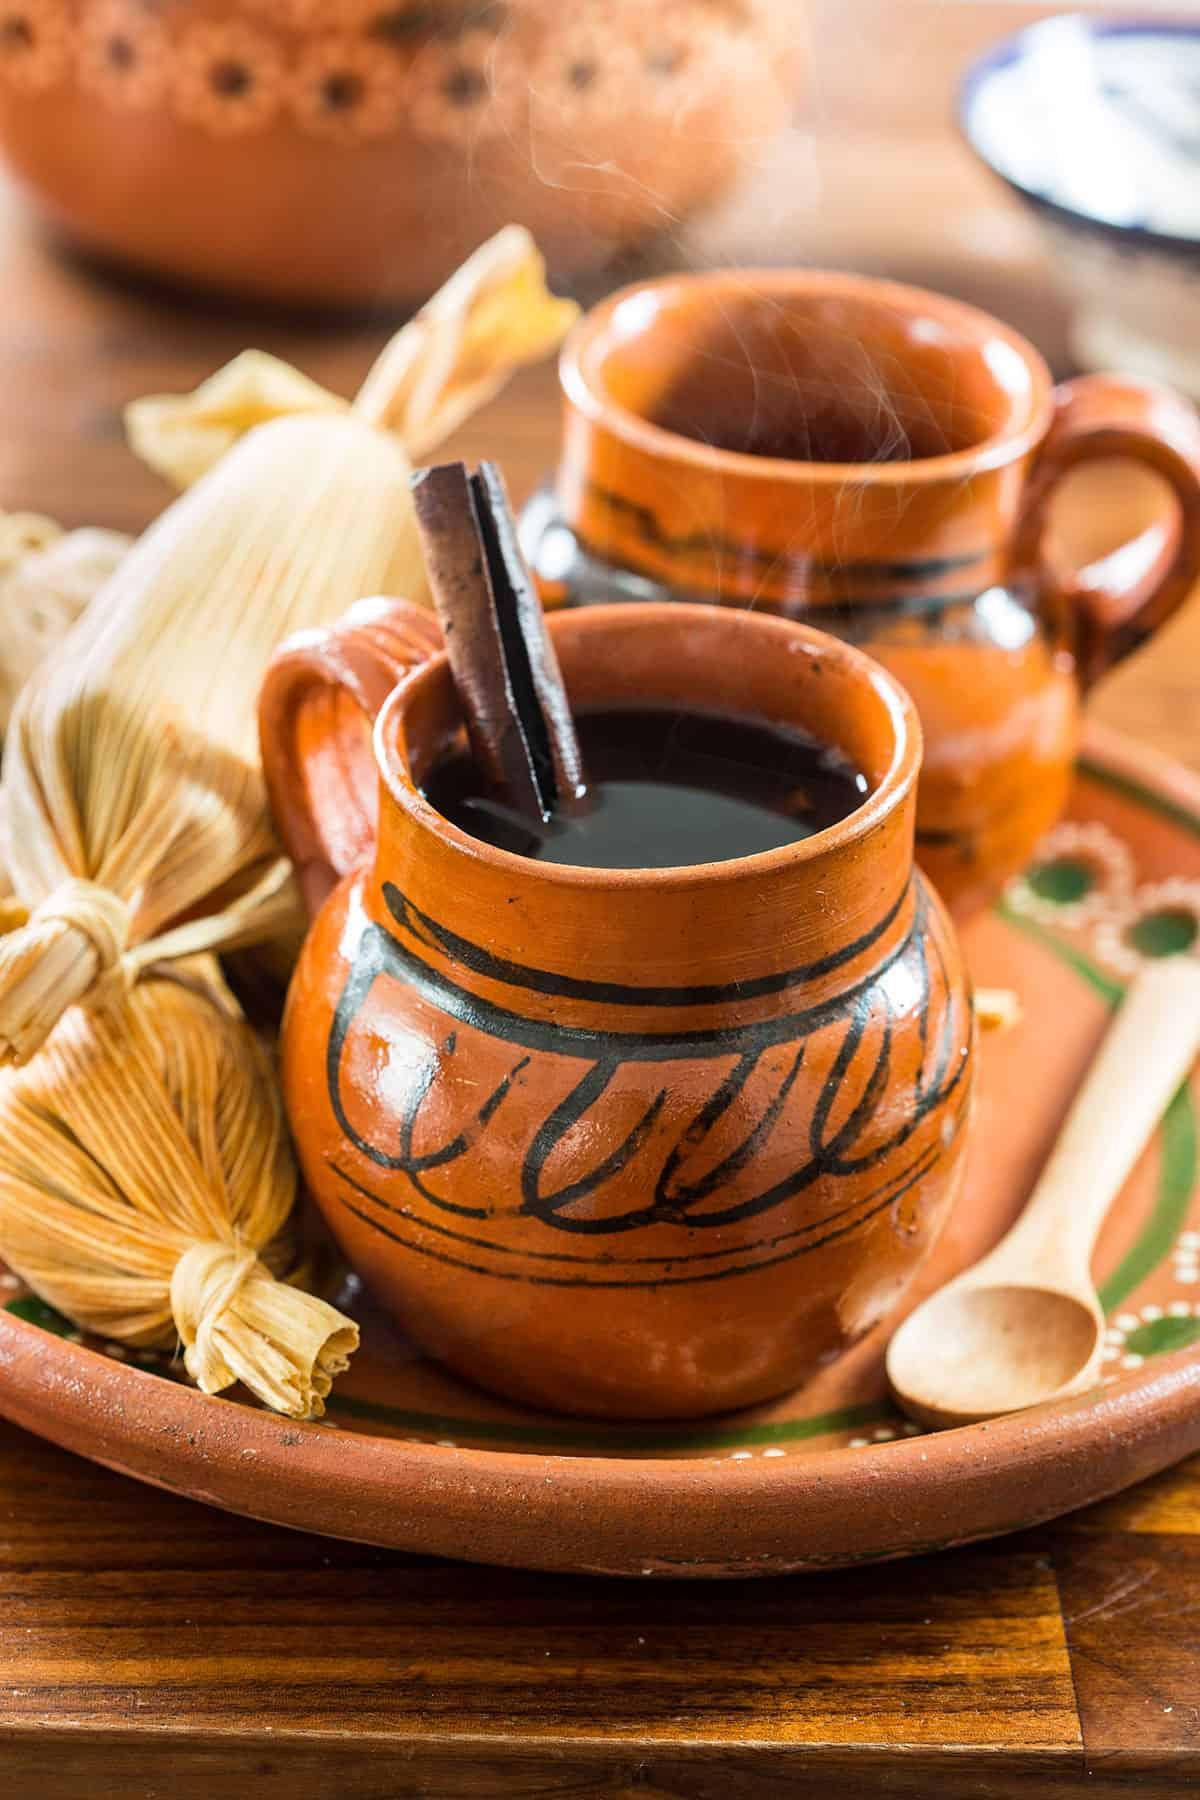 Two clay mugs with steamy café de olla.